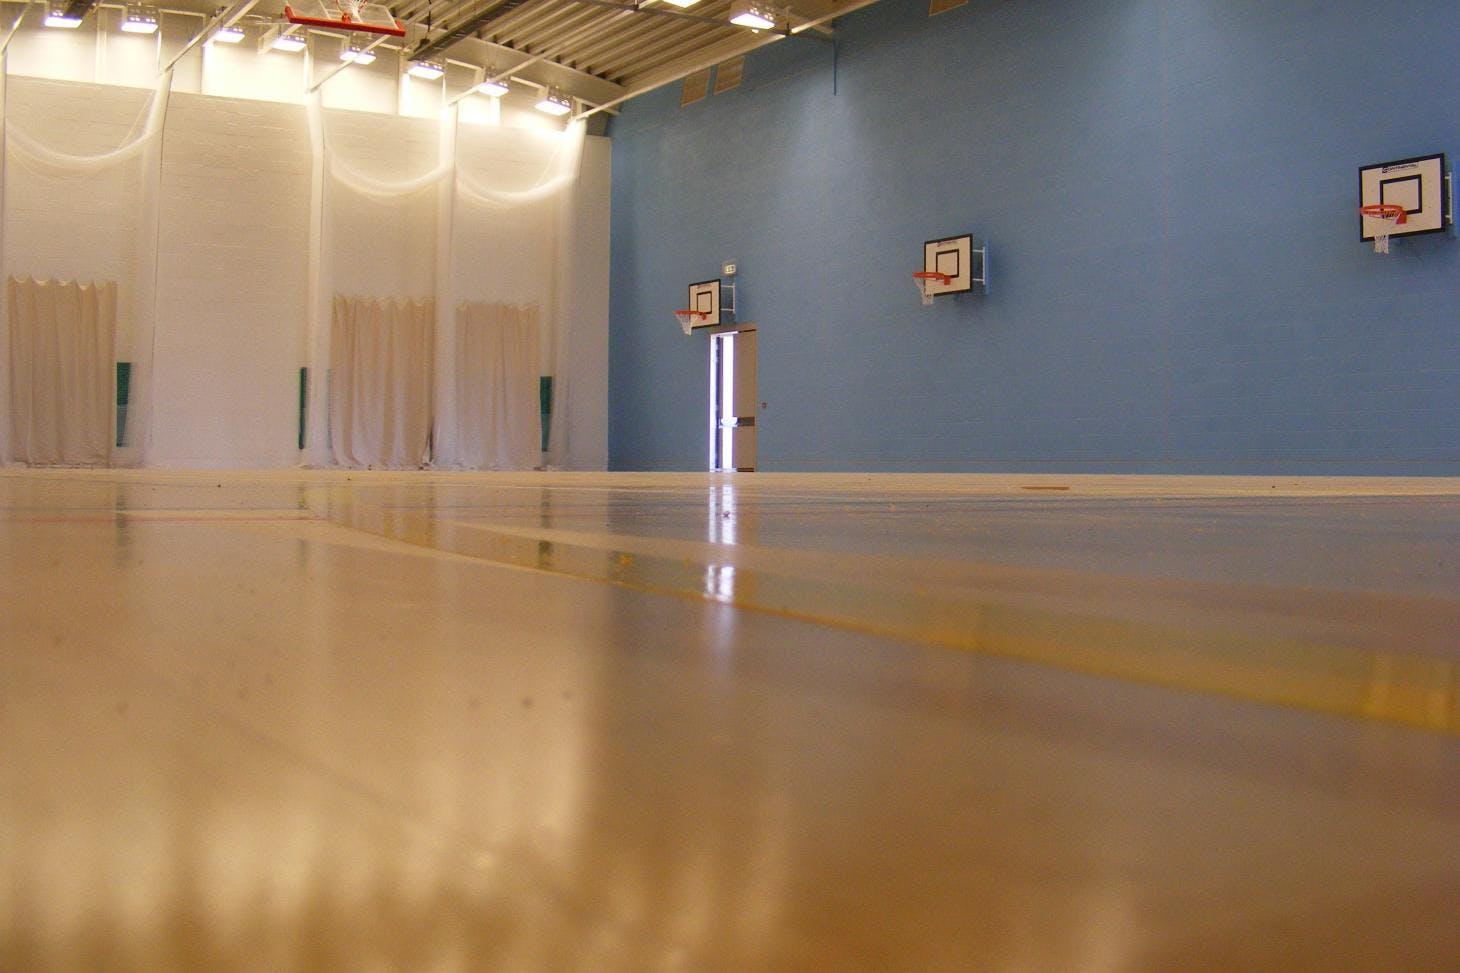 Dagenham Park Leisure Centre Indoor | Hard badminton court